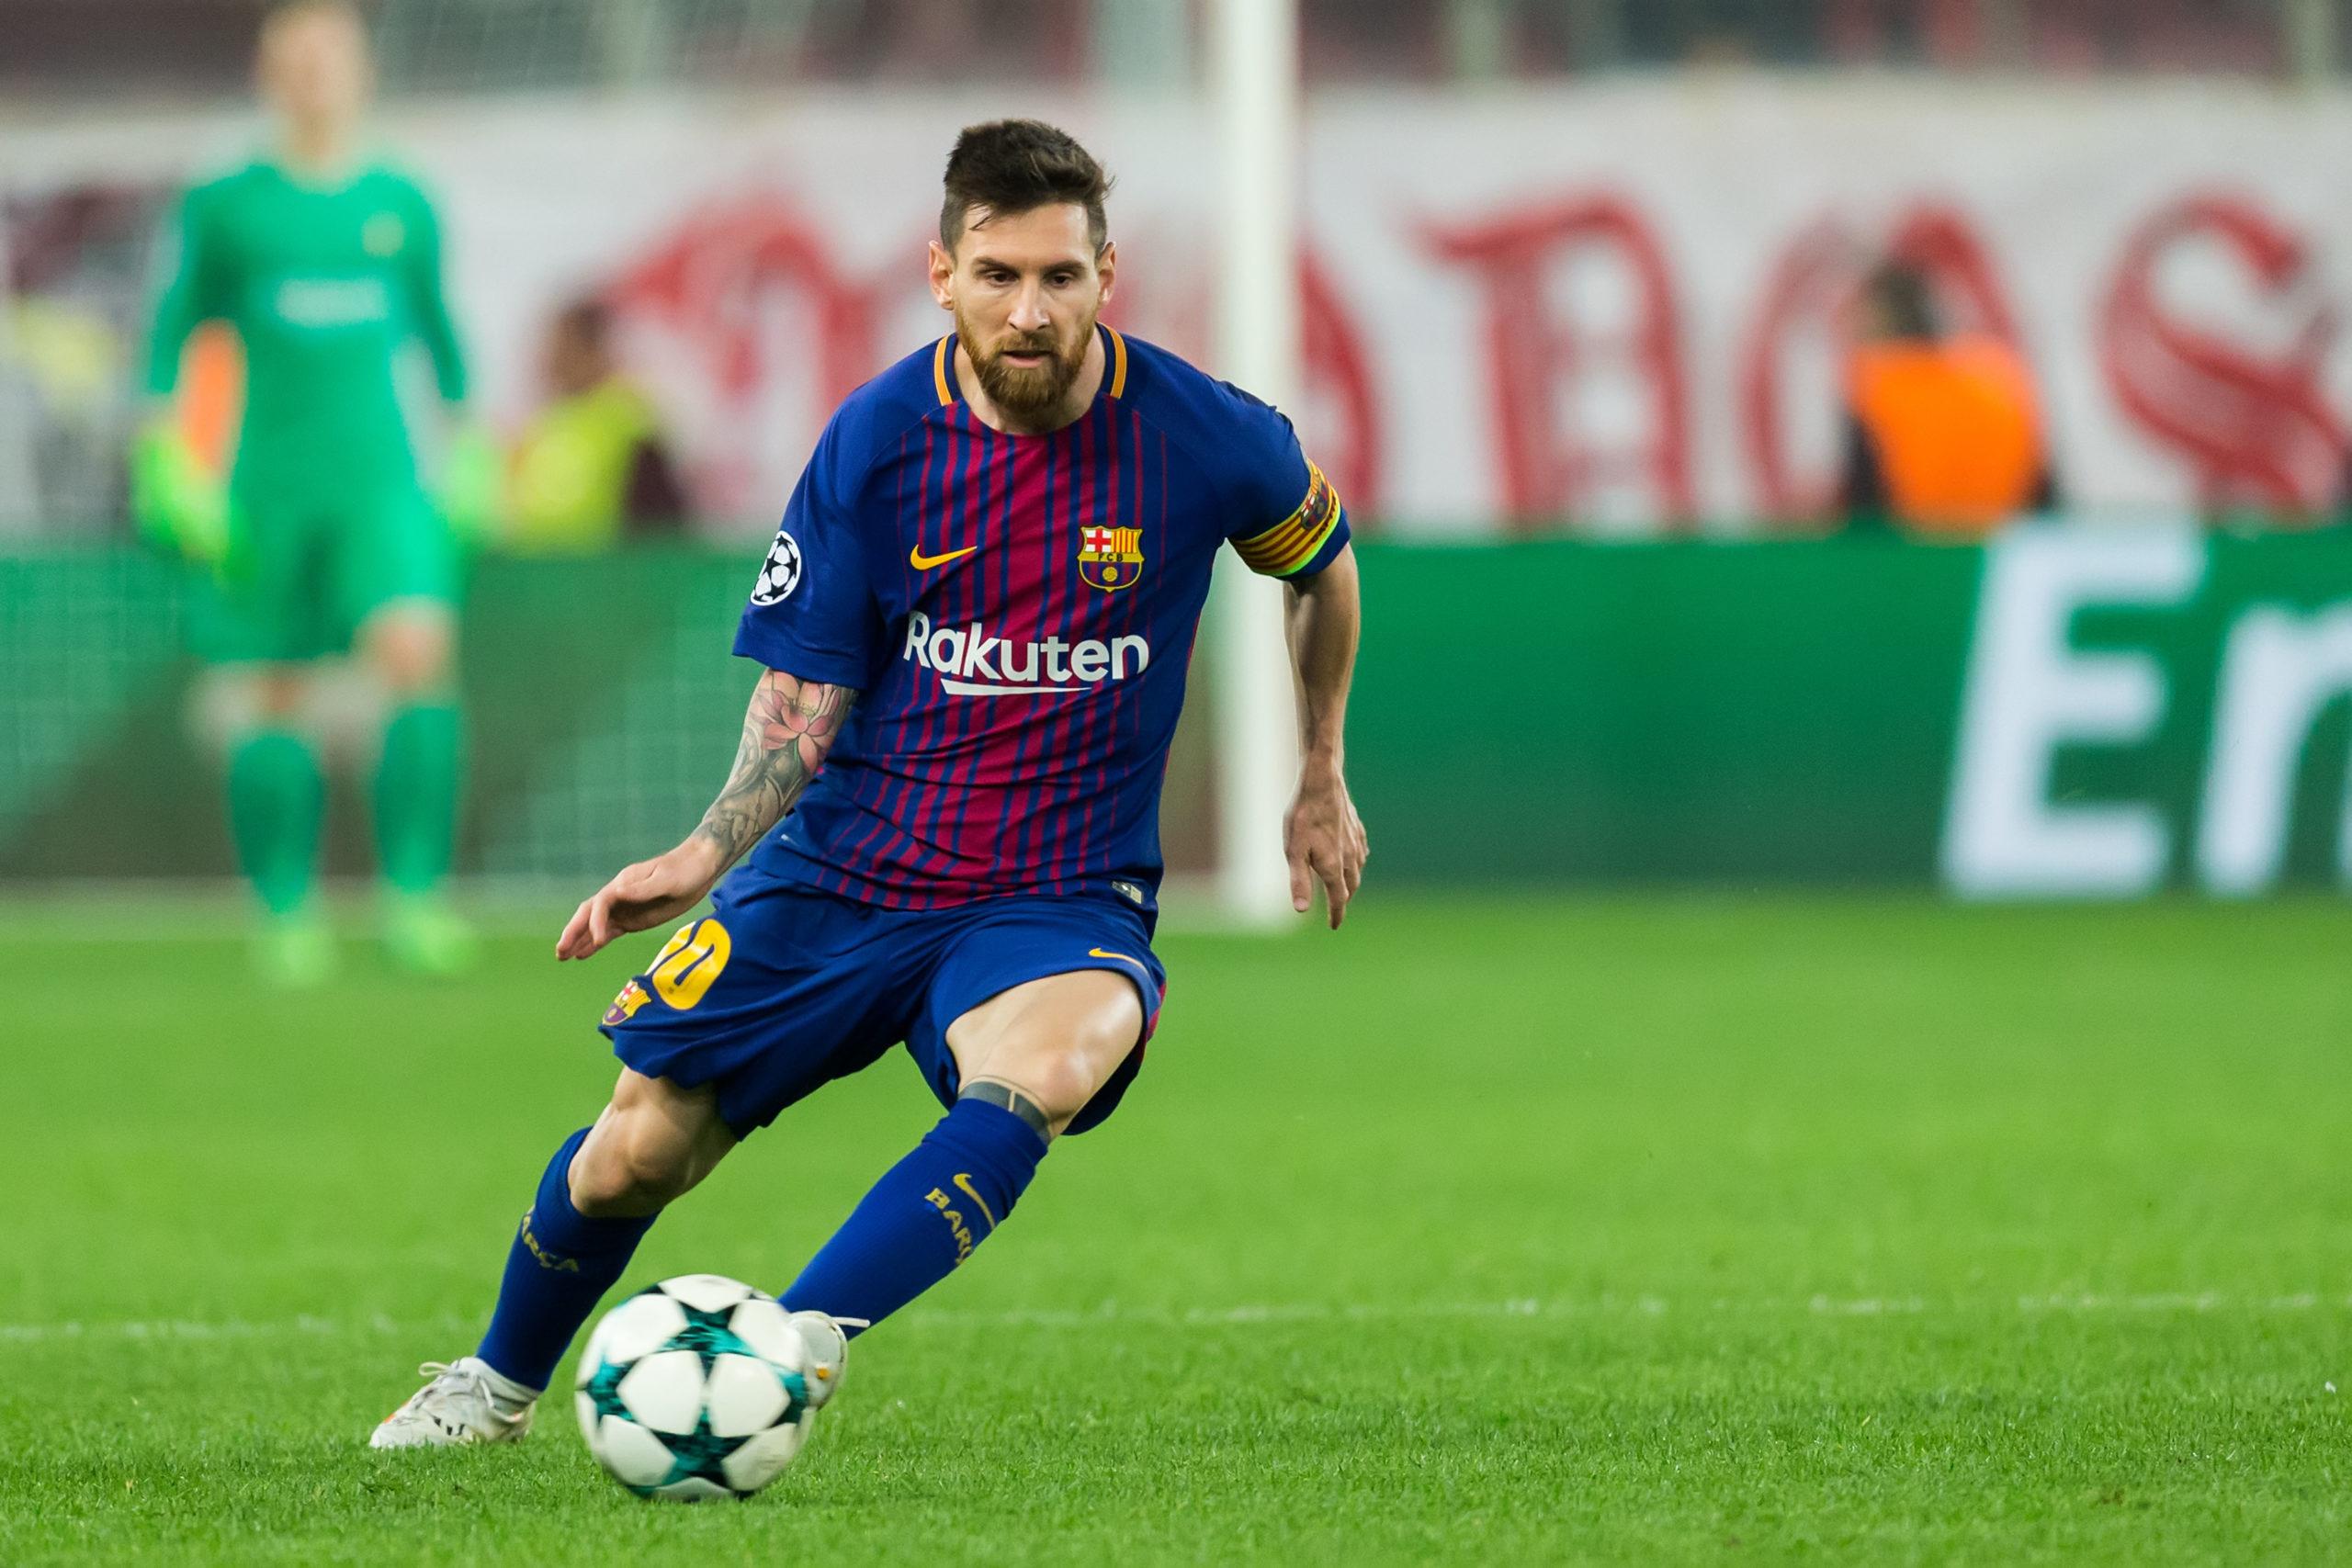 Barcelona fotball se fotballkamp Spania